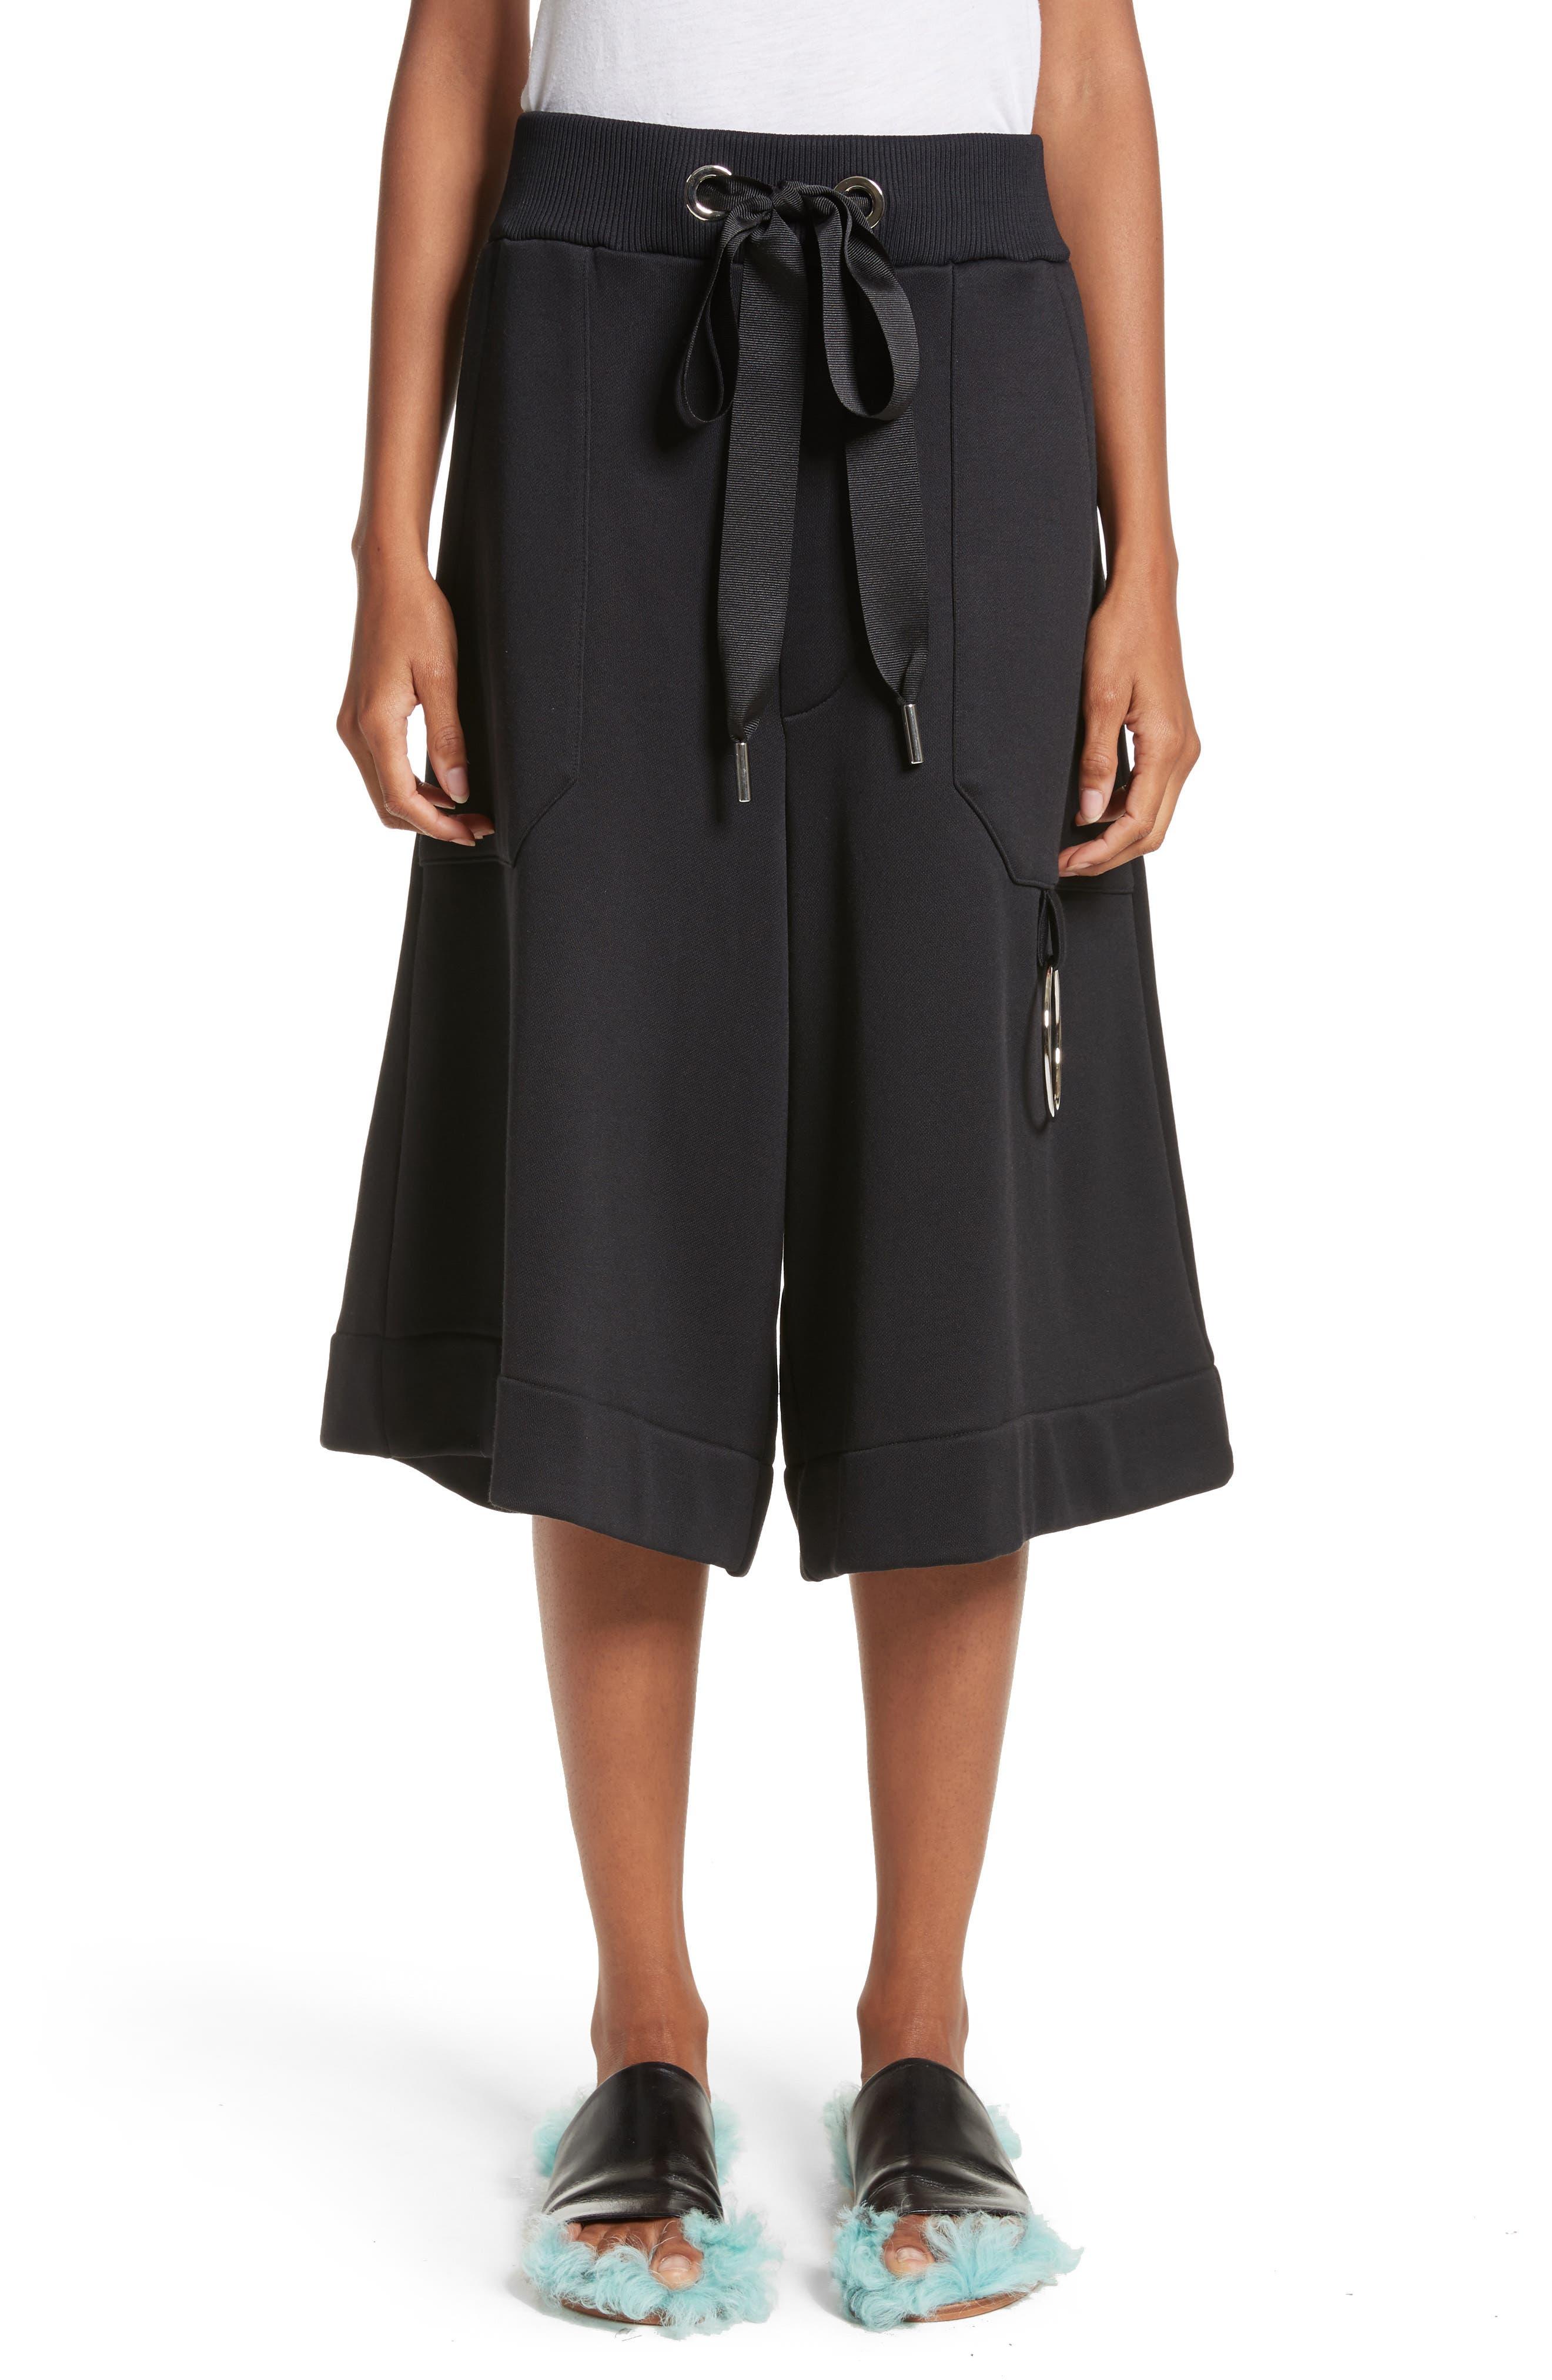 Alternate Image 1 Selected - Marques'Almeida Tracksuit Wide Leg Fleece Shorts